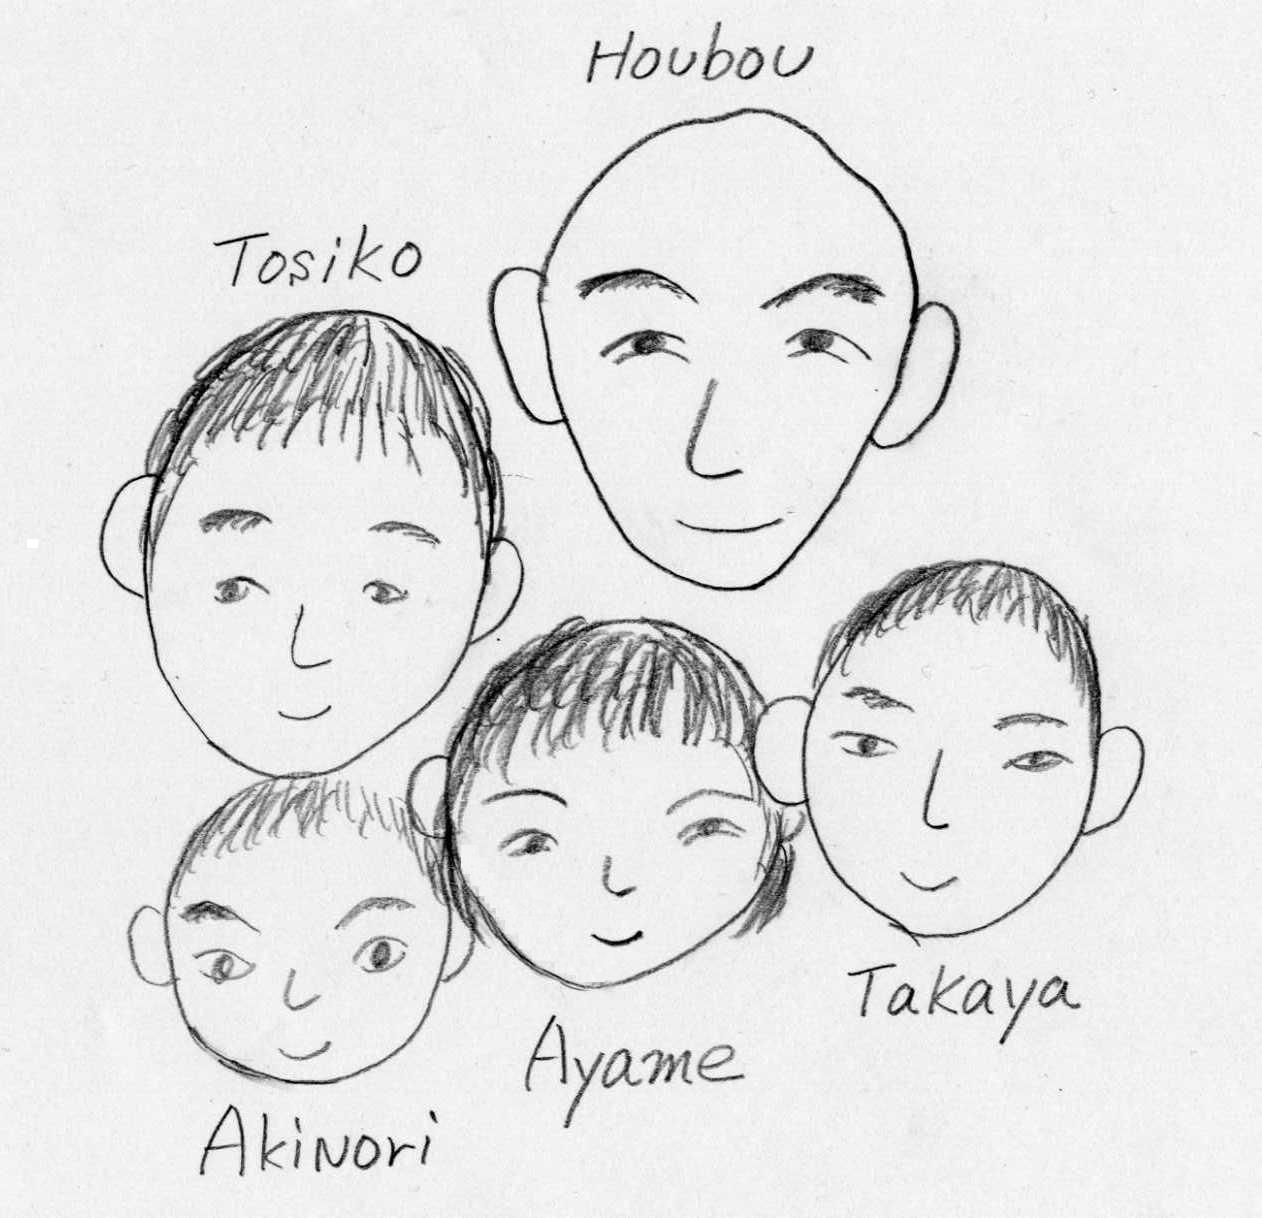 Okamurayuta additionally 2005 Honda Element Fuse Diagram further Robots Foes Leonardorobotchildofcynthiabreazeal X1JUo1J9uM3Ru moreover Sp08 likewise 201103 1. on page3